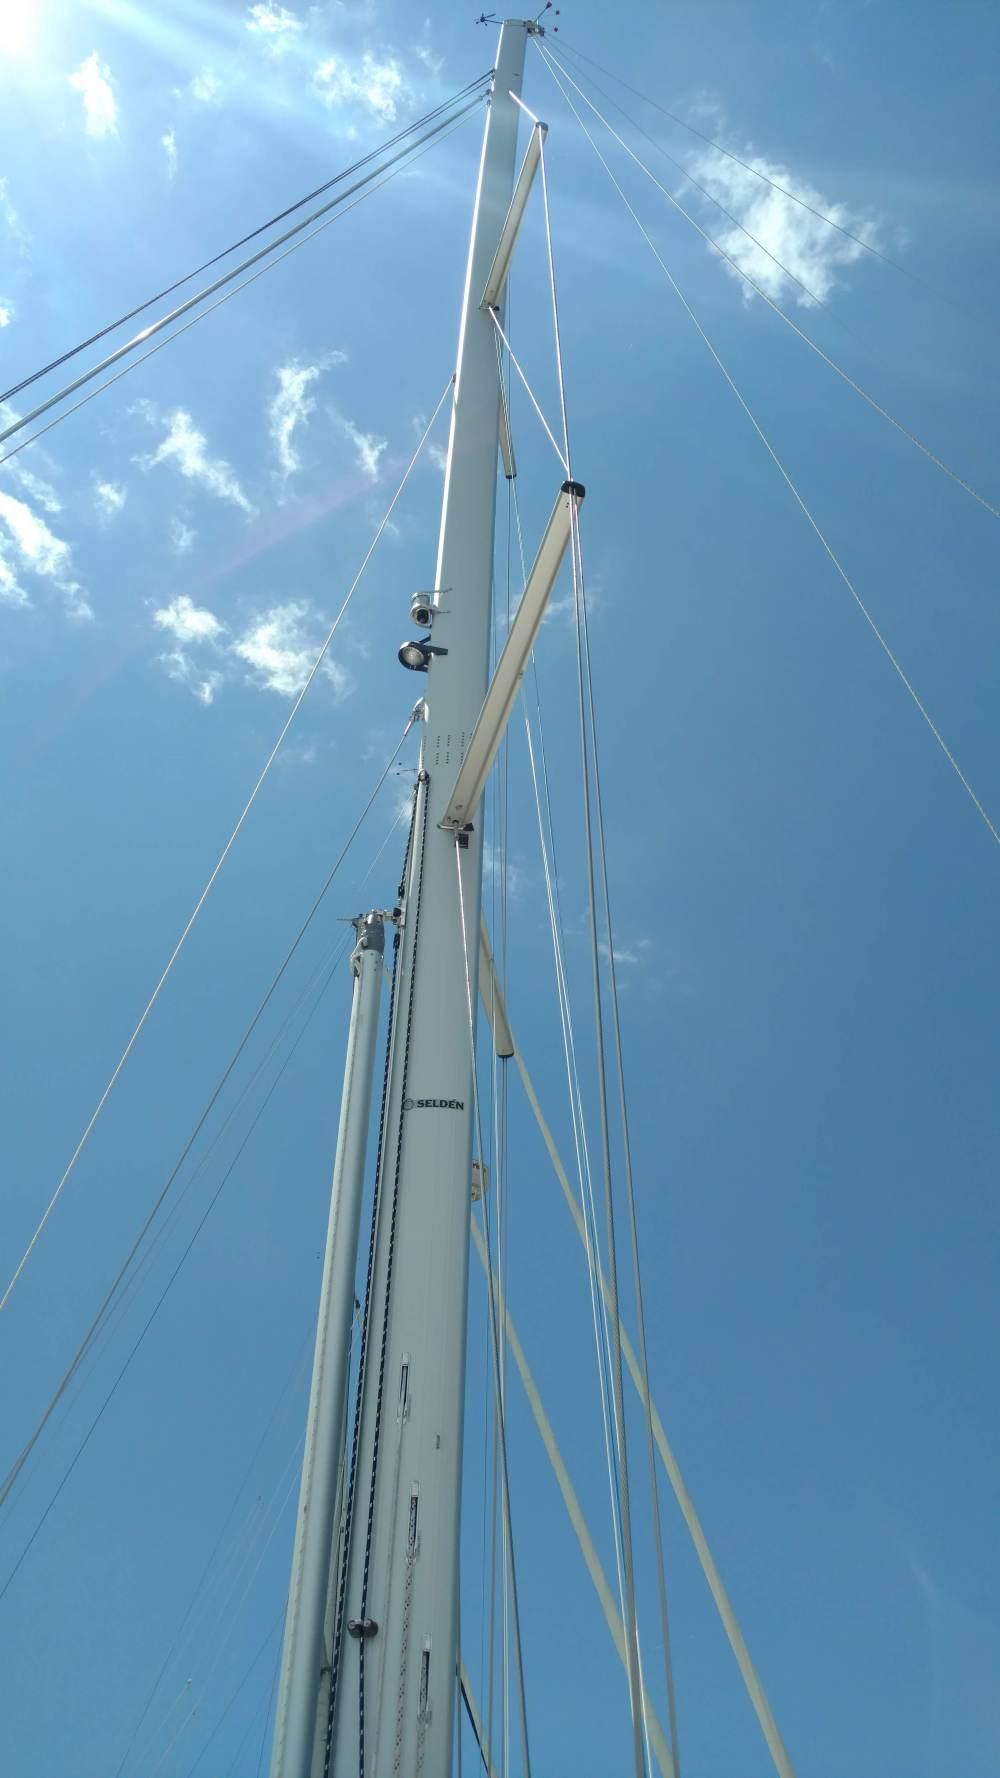 New Selden Mast...TRC Style Dufour 43 Tall Mast